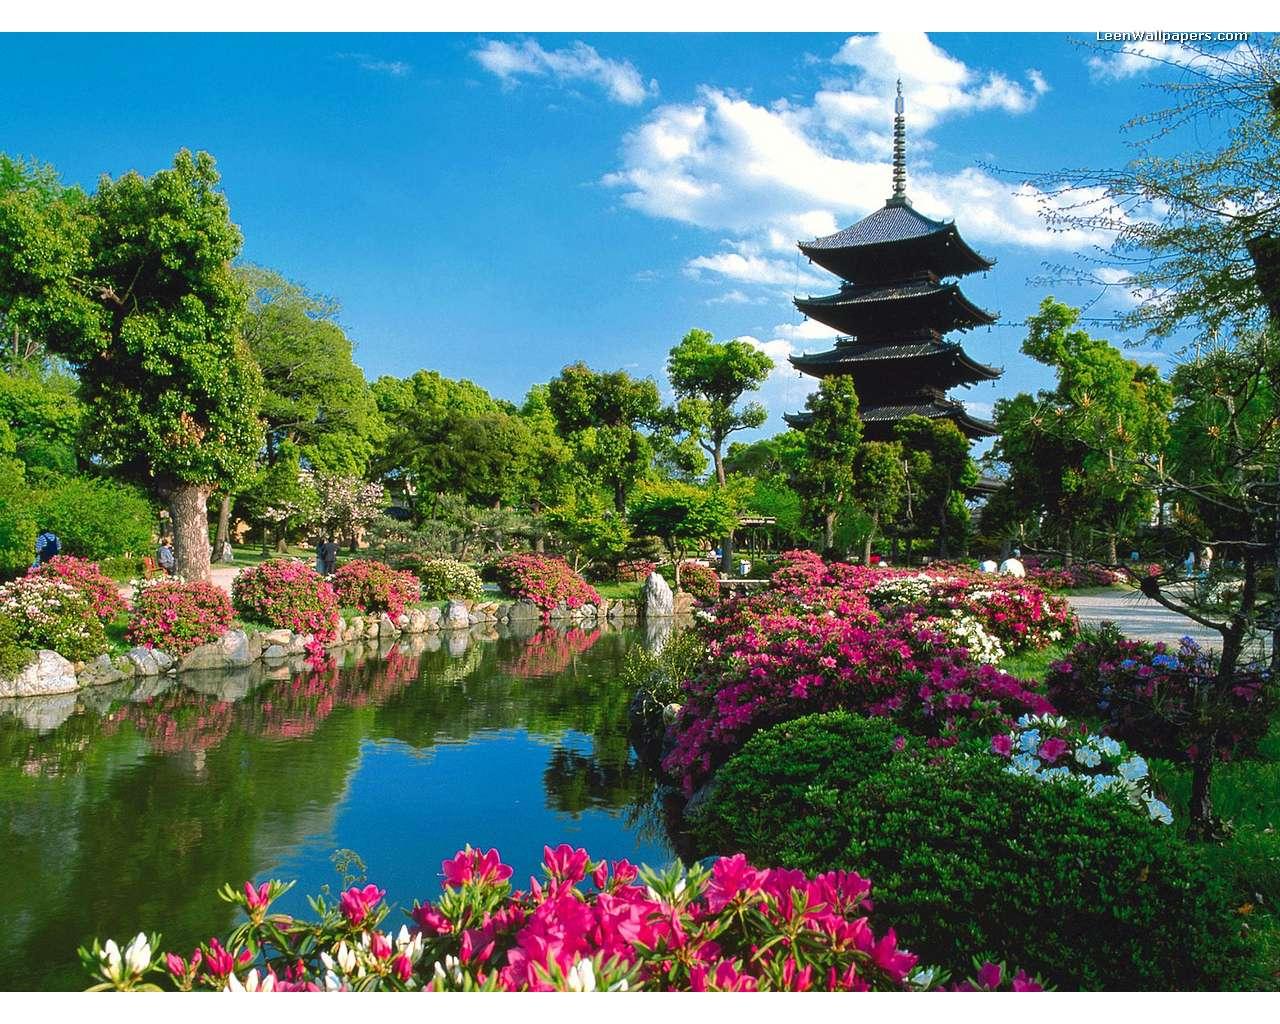 Wallpaper download garden - Beautiful Garden Wallpaper Sky Designs